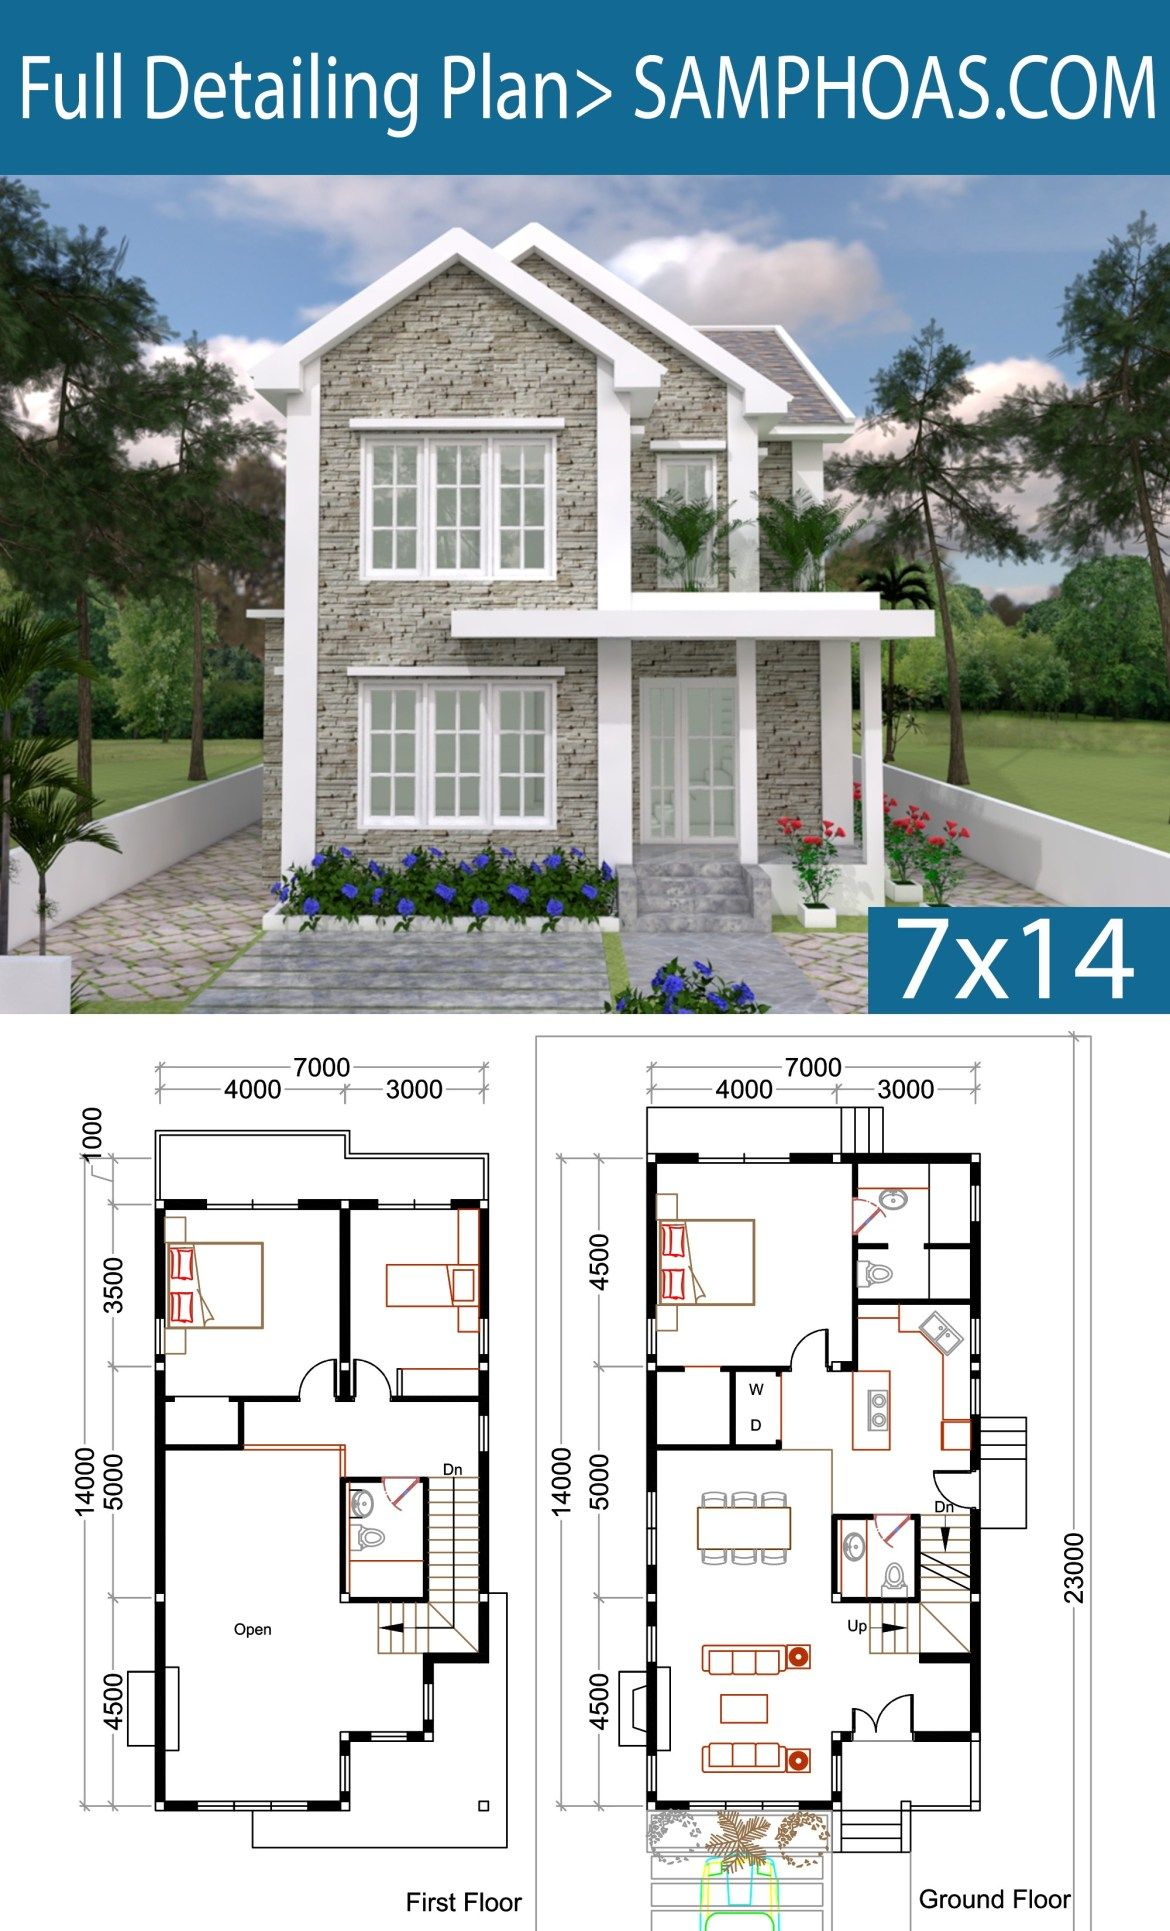 3 Bedrooms Home Plan 7x14m Samphoas Plansearch House Design Dream House Plans House Plans